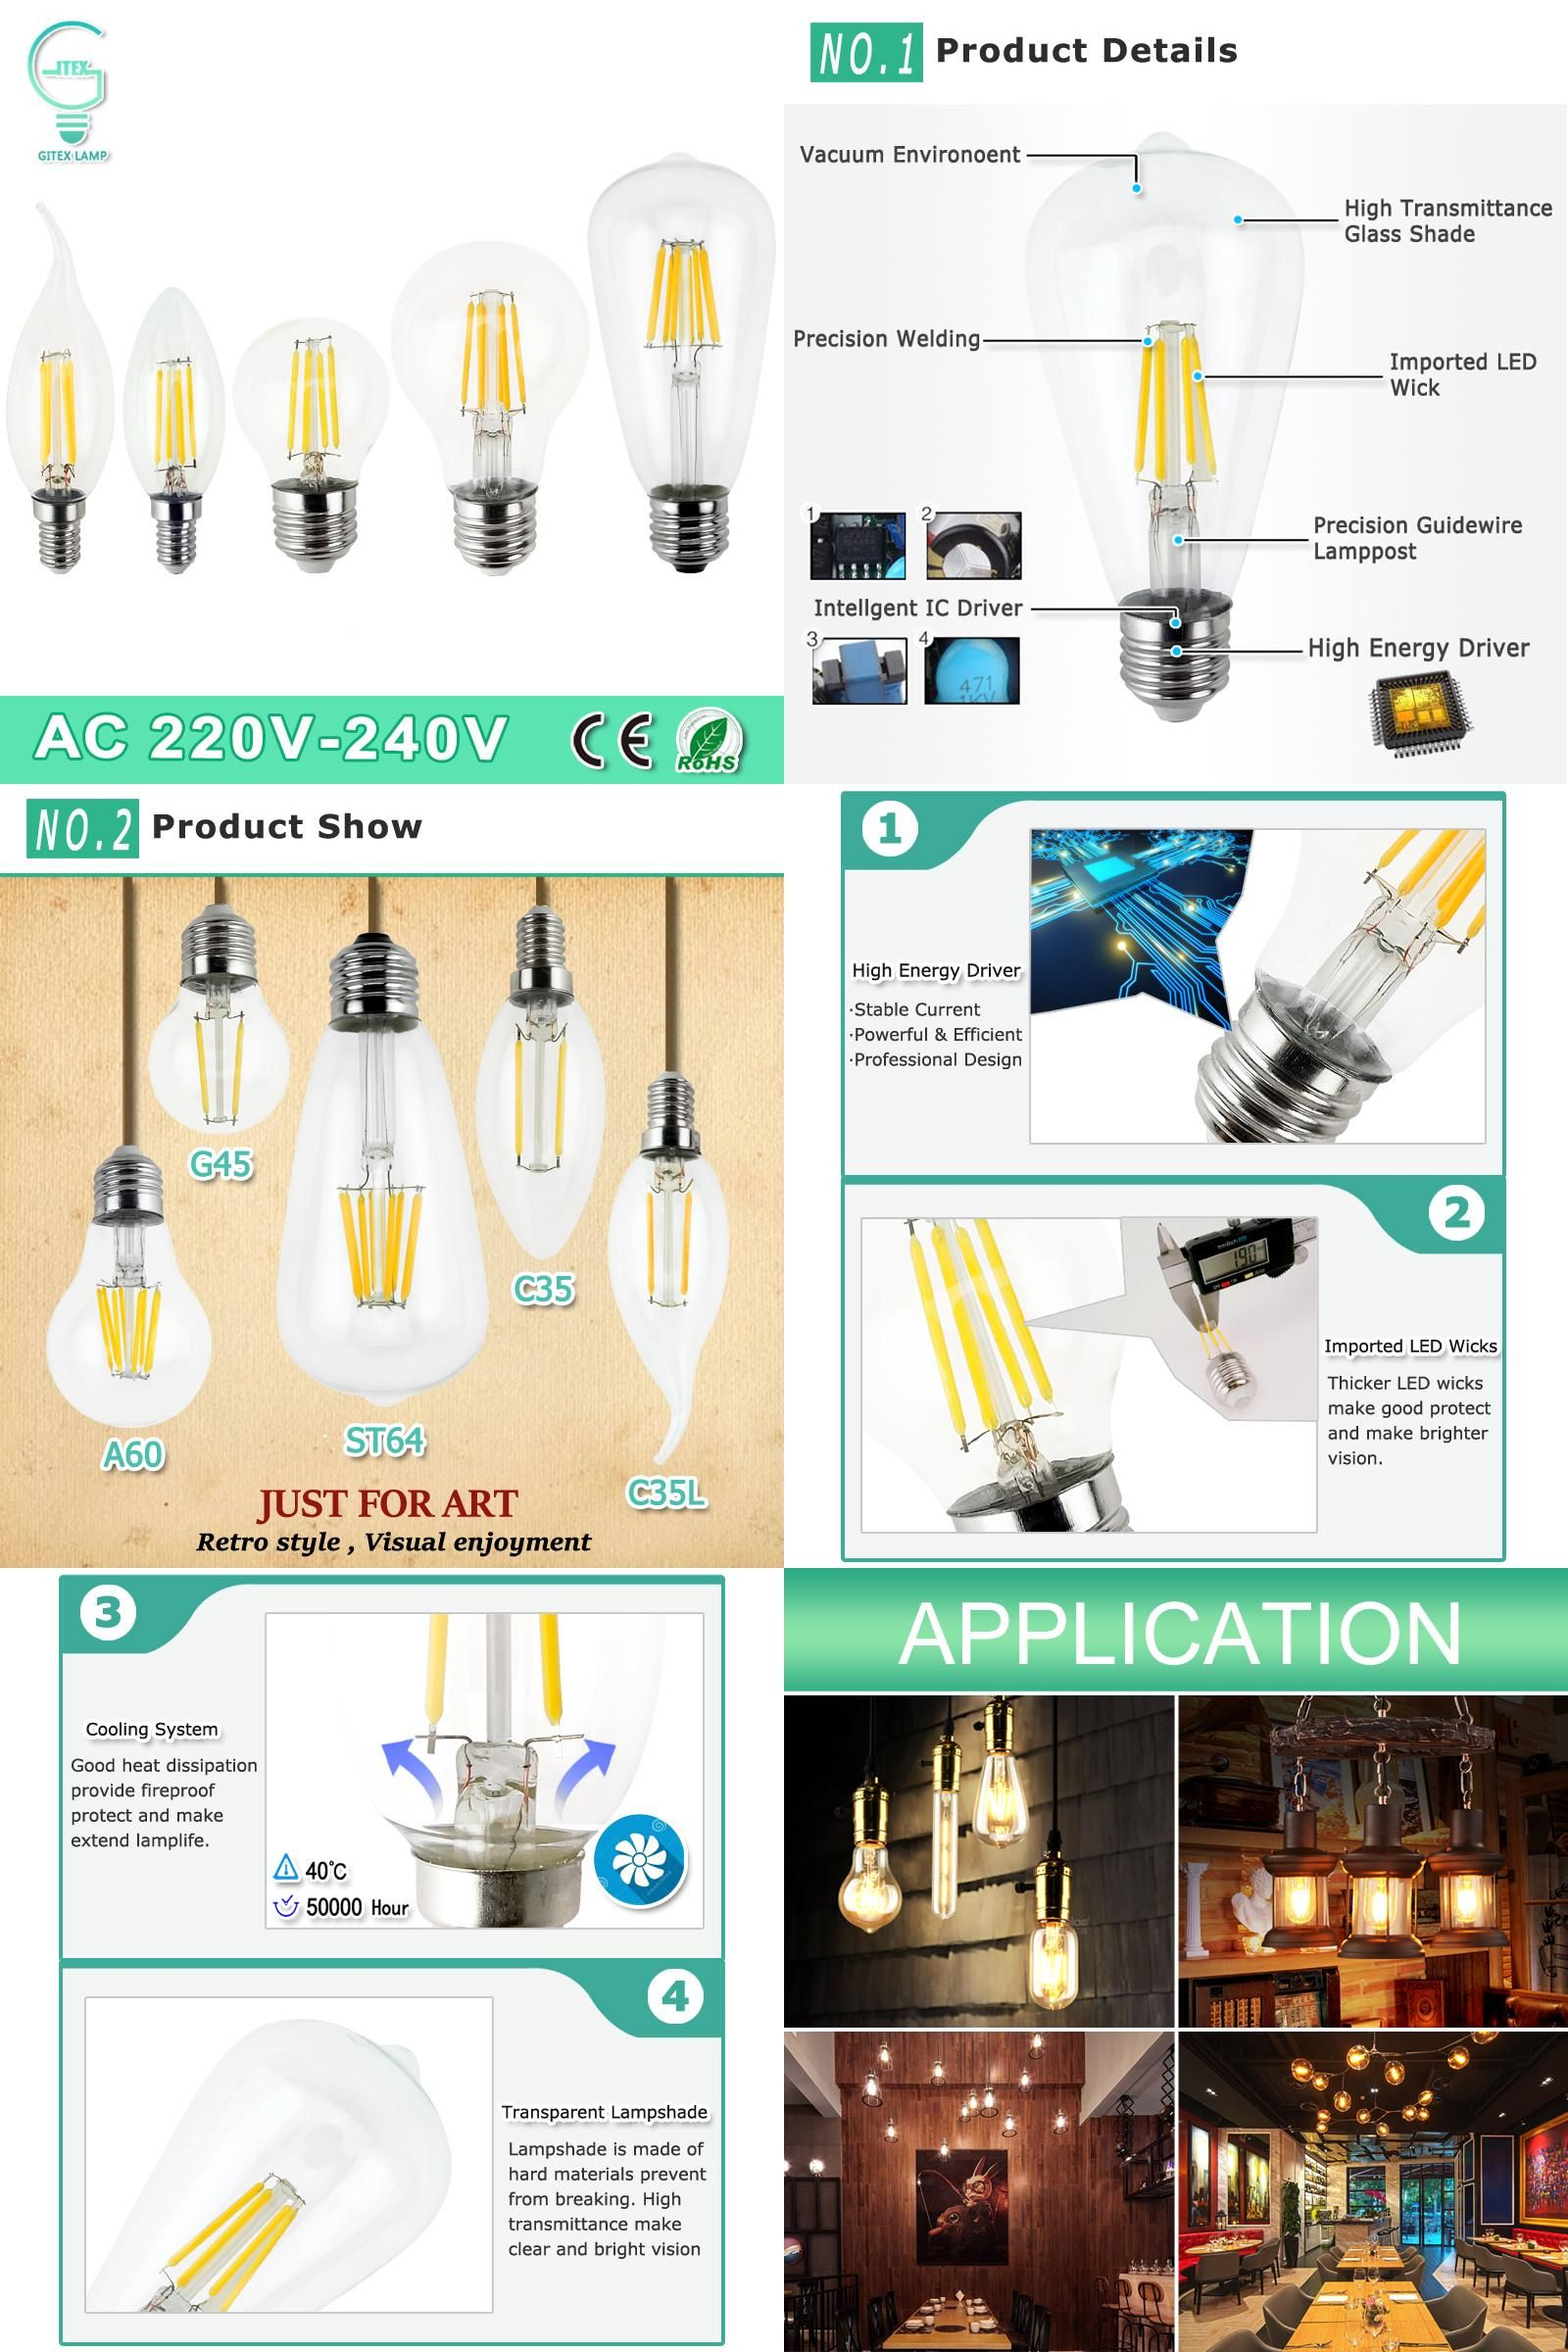 Visit To Buy Dimmable E27 Led Filament Light Glass Housing Bulb E14 Lamp 220v 2w 4w 6w 8w Led Fi Glass Candle Lighting Edison Bulb Lamp Vintage Edison Bulbs